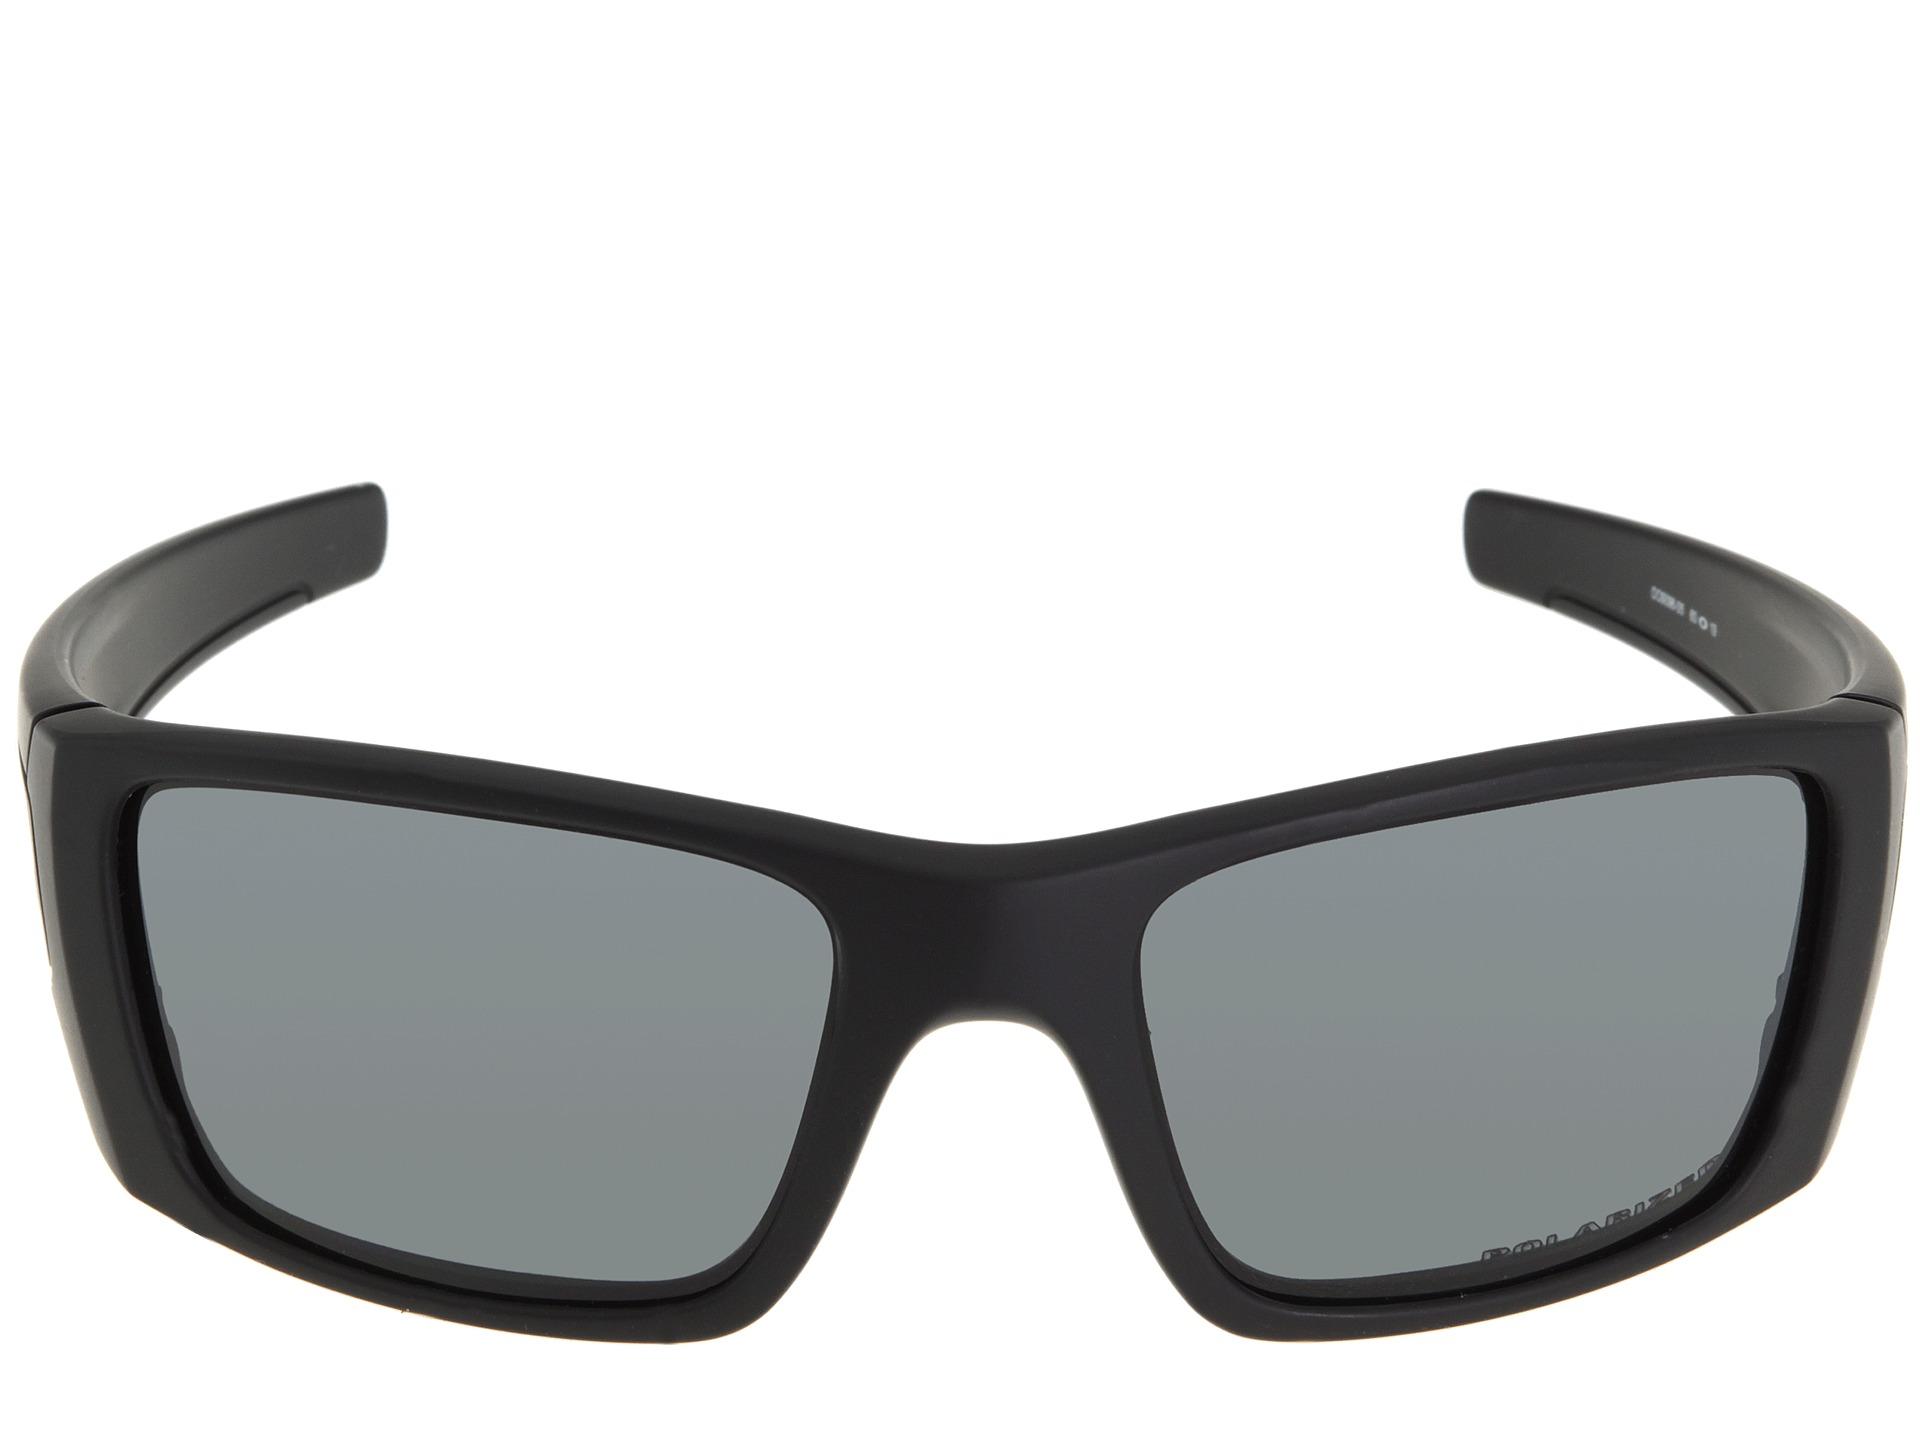 d5222e218a Oakley Fuel Cell™ Polarized Matte Black Matte Black Grey Polarized - swbmai.